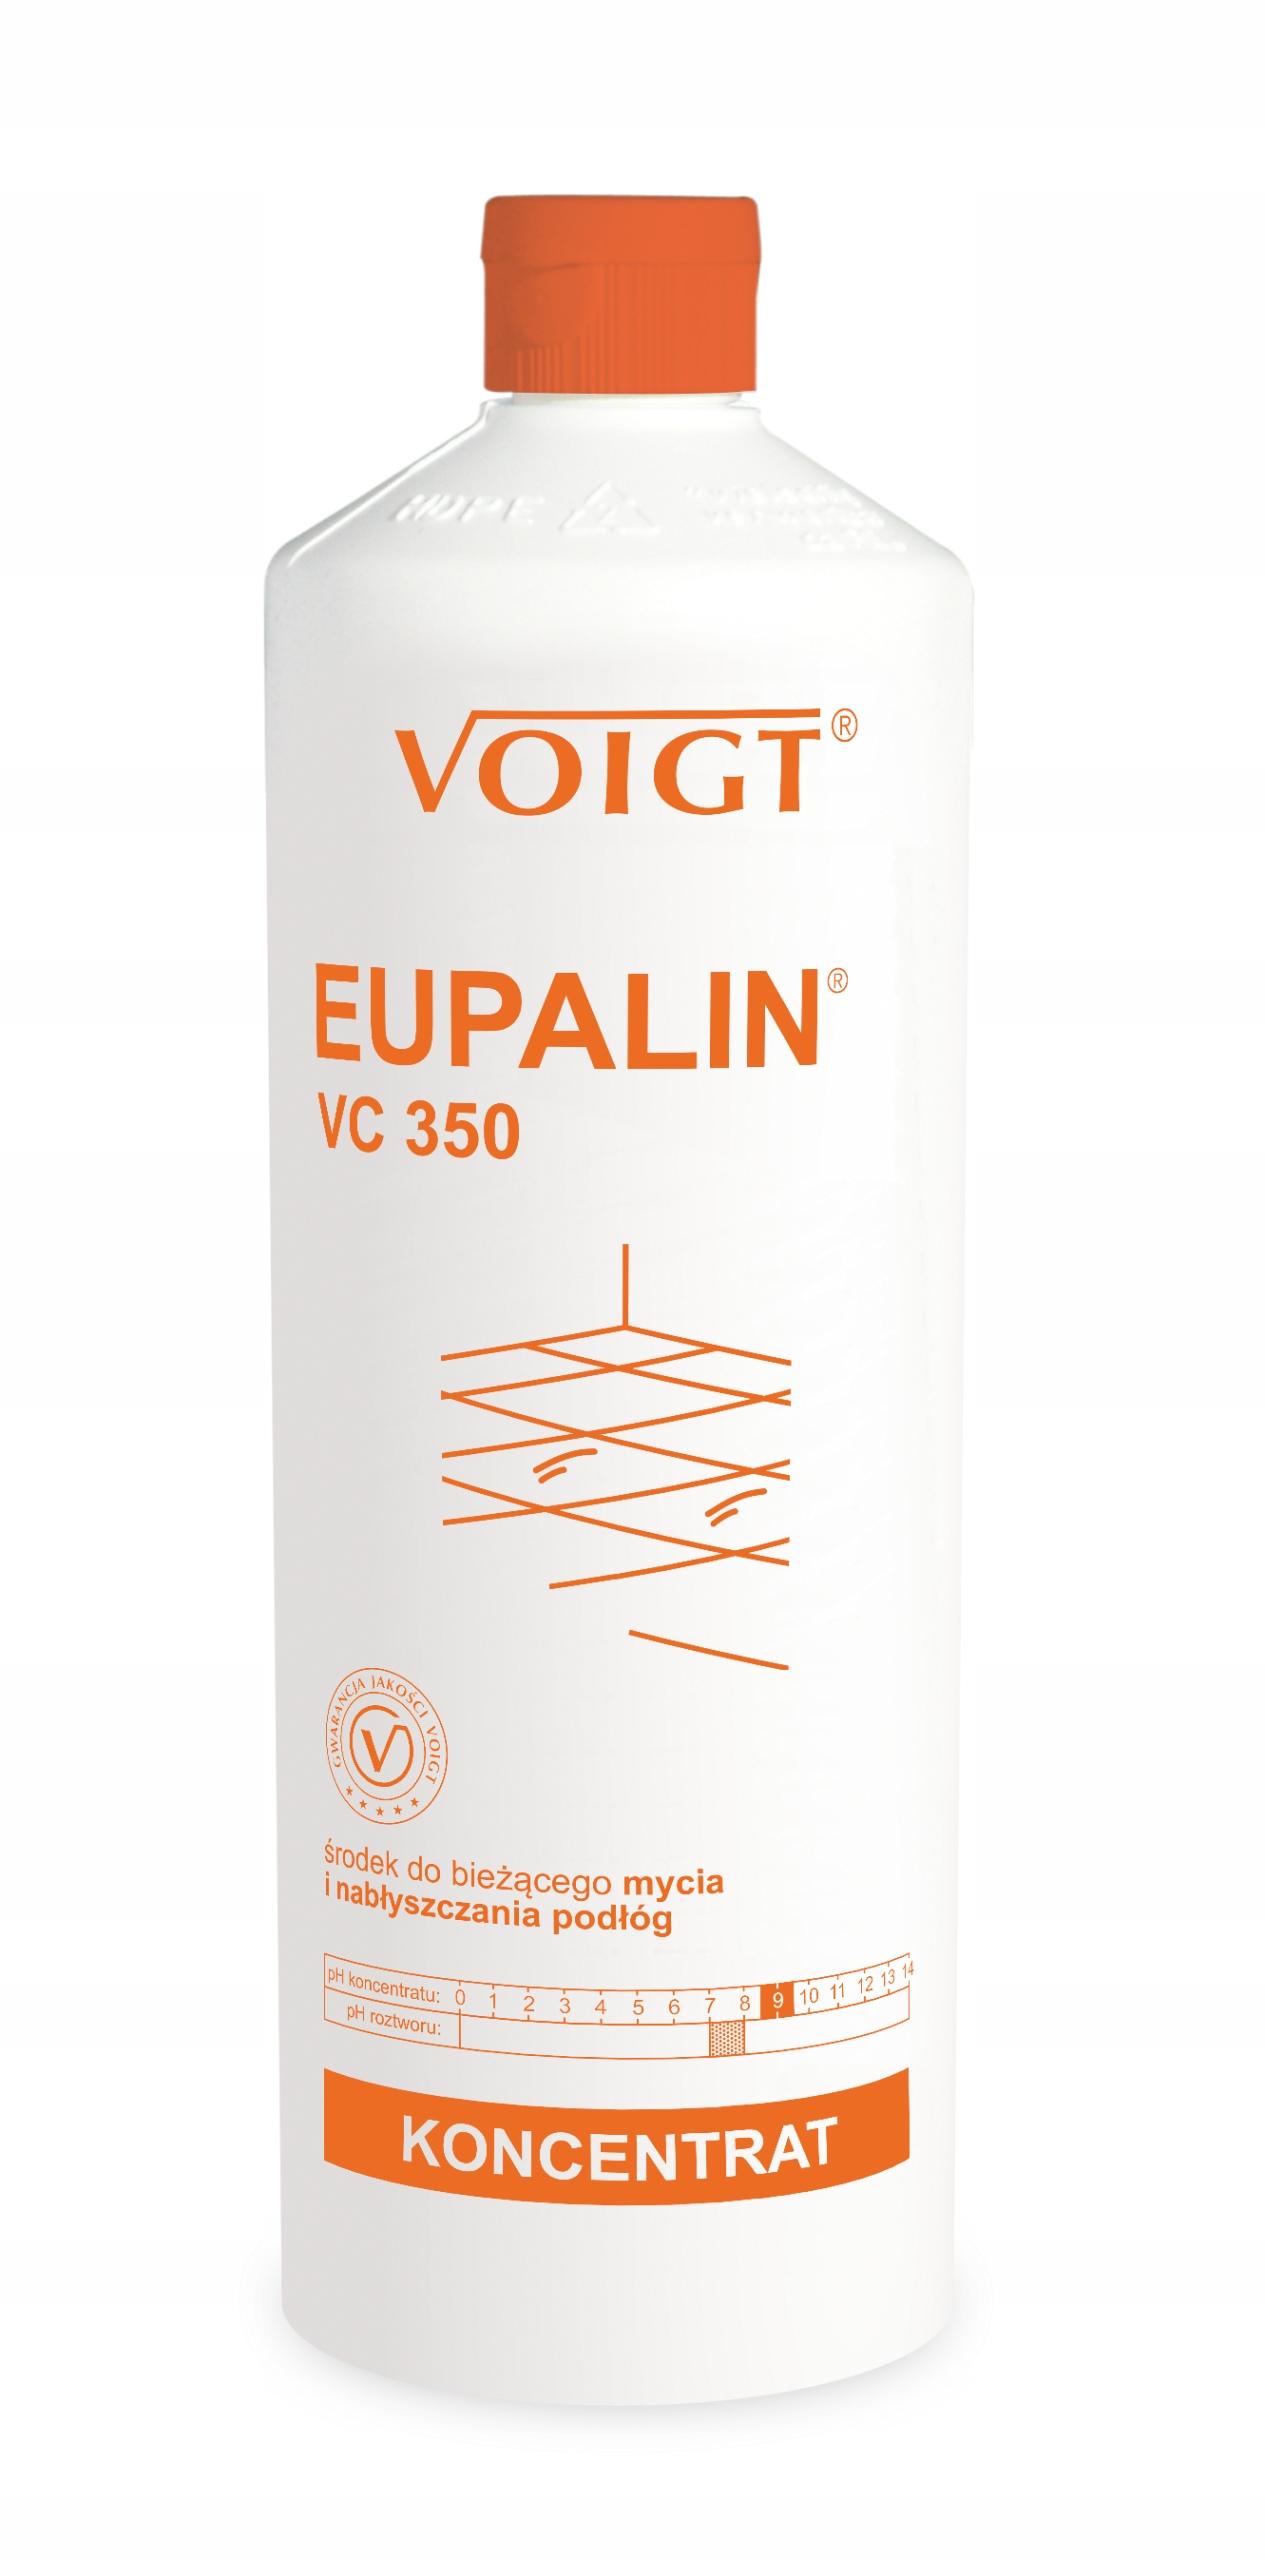 Voigt EUPALIN VC 350 для мытья глянца 1 литр